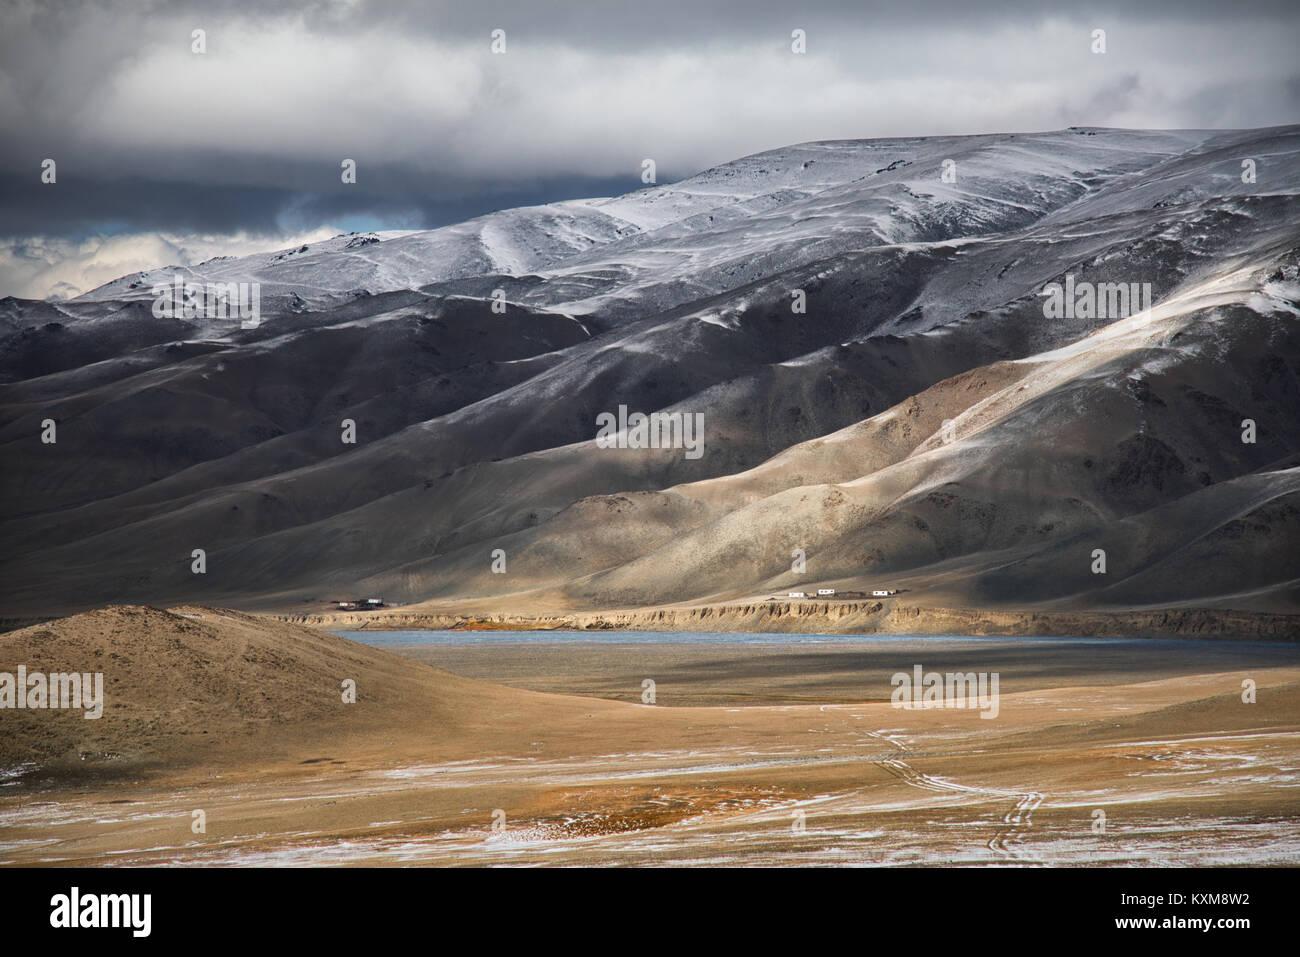 Mongolian landscape snowy mountains snow winter cloudy Mongolia - Stock Image